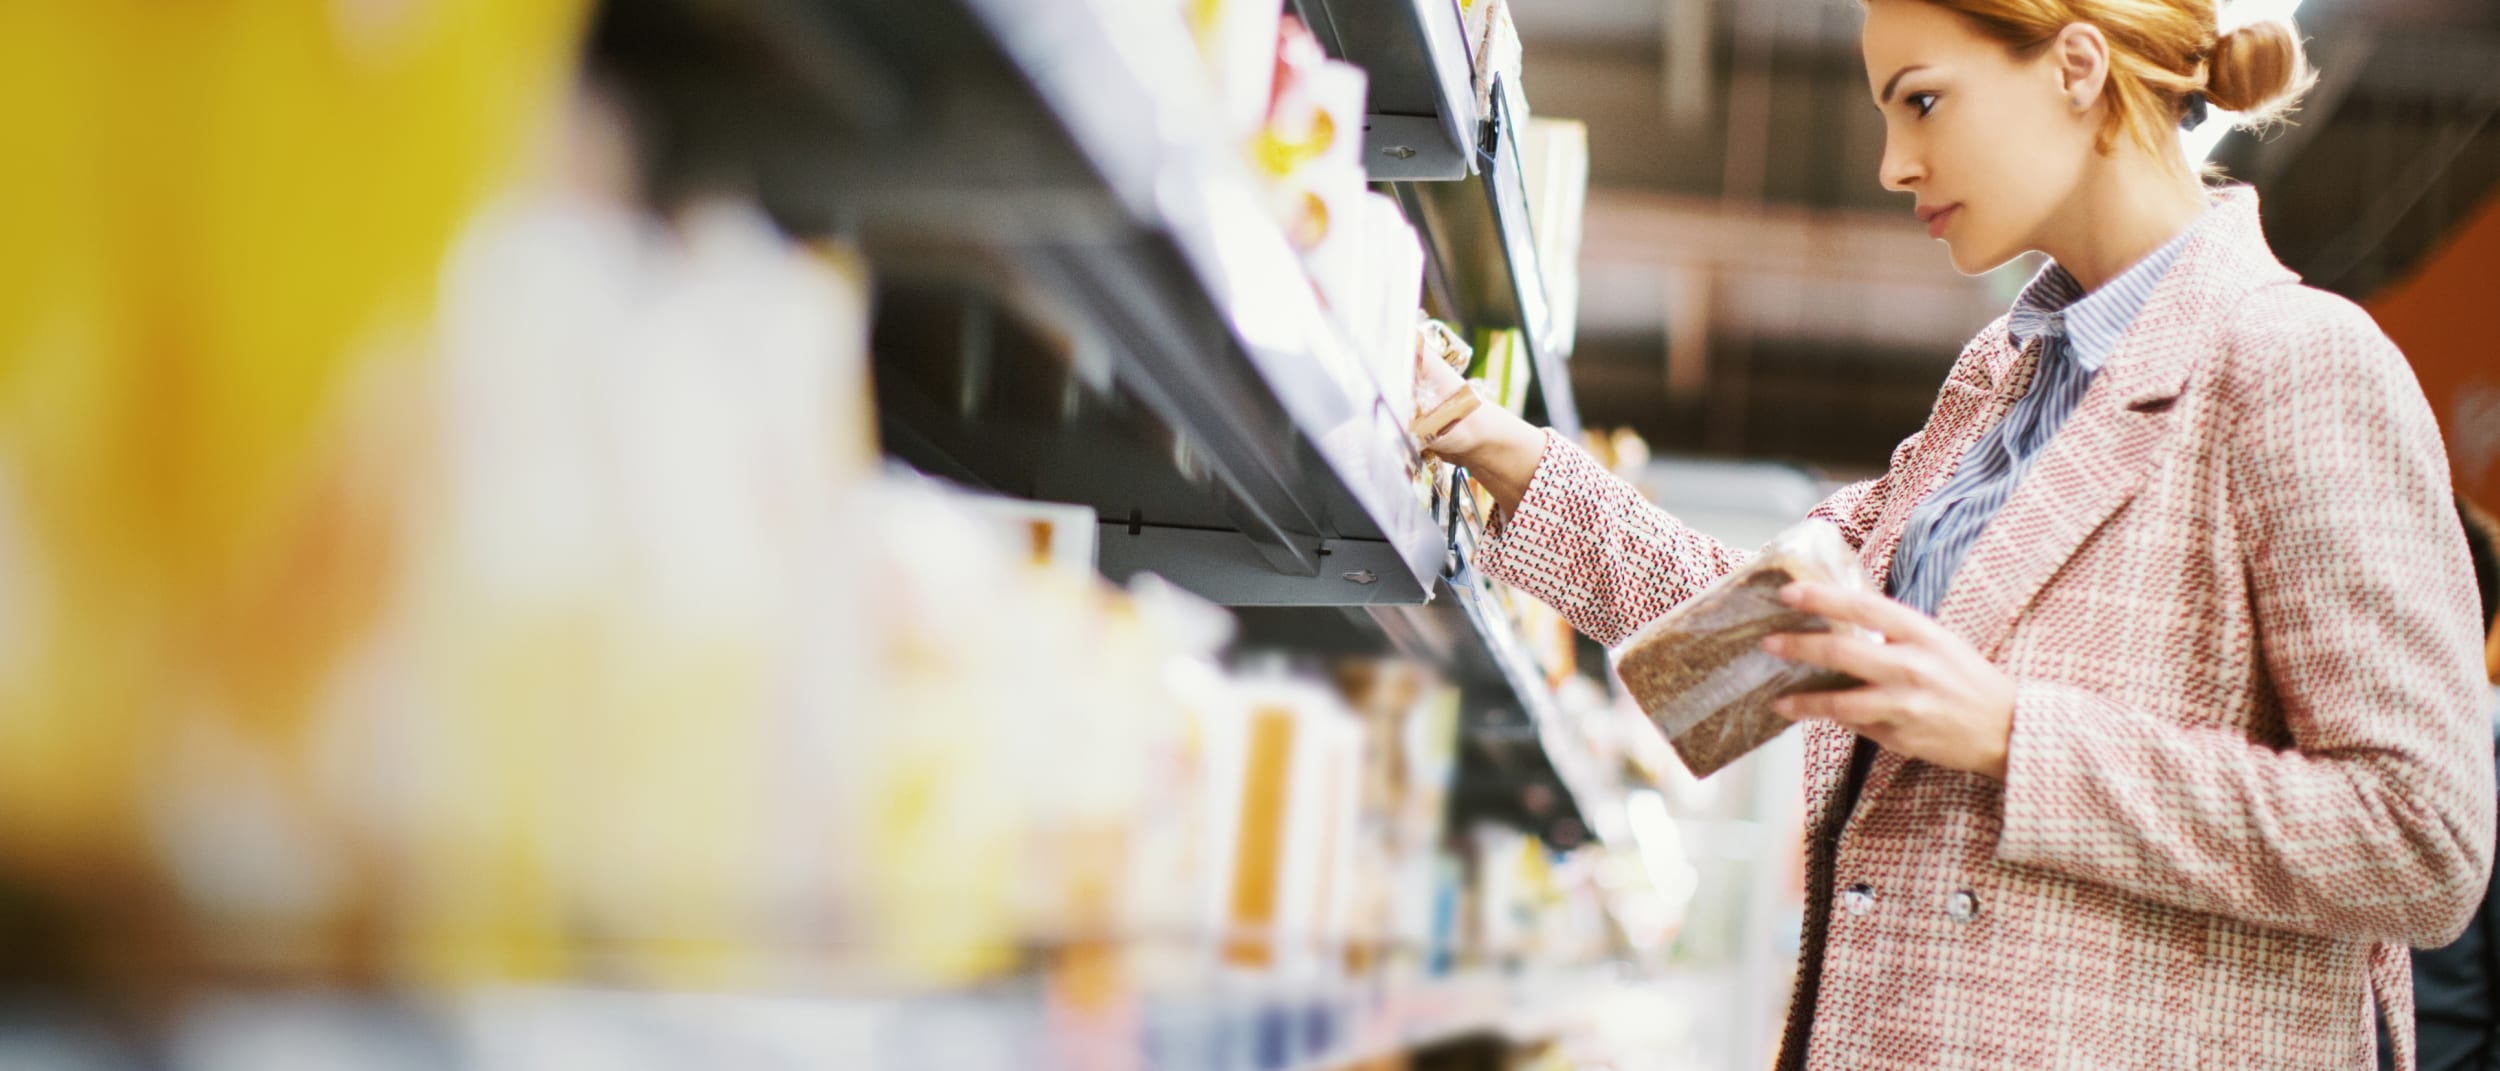 Deciphering Gluten Free Food Labeling